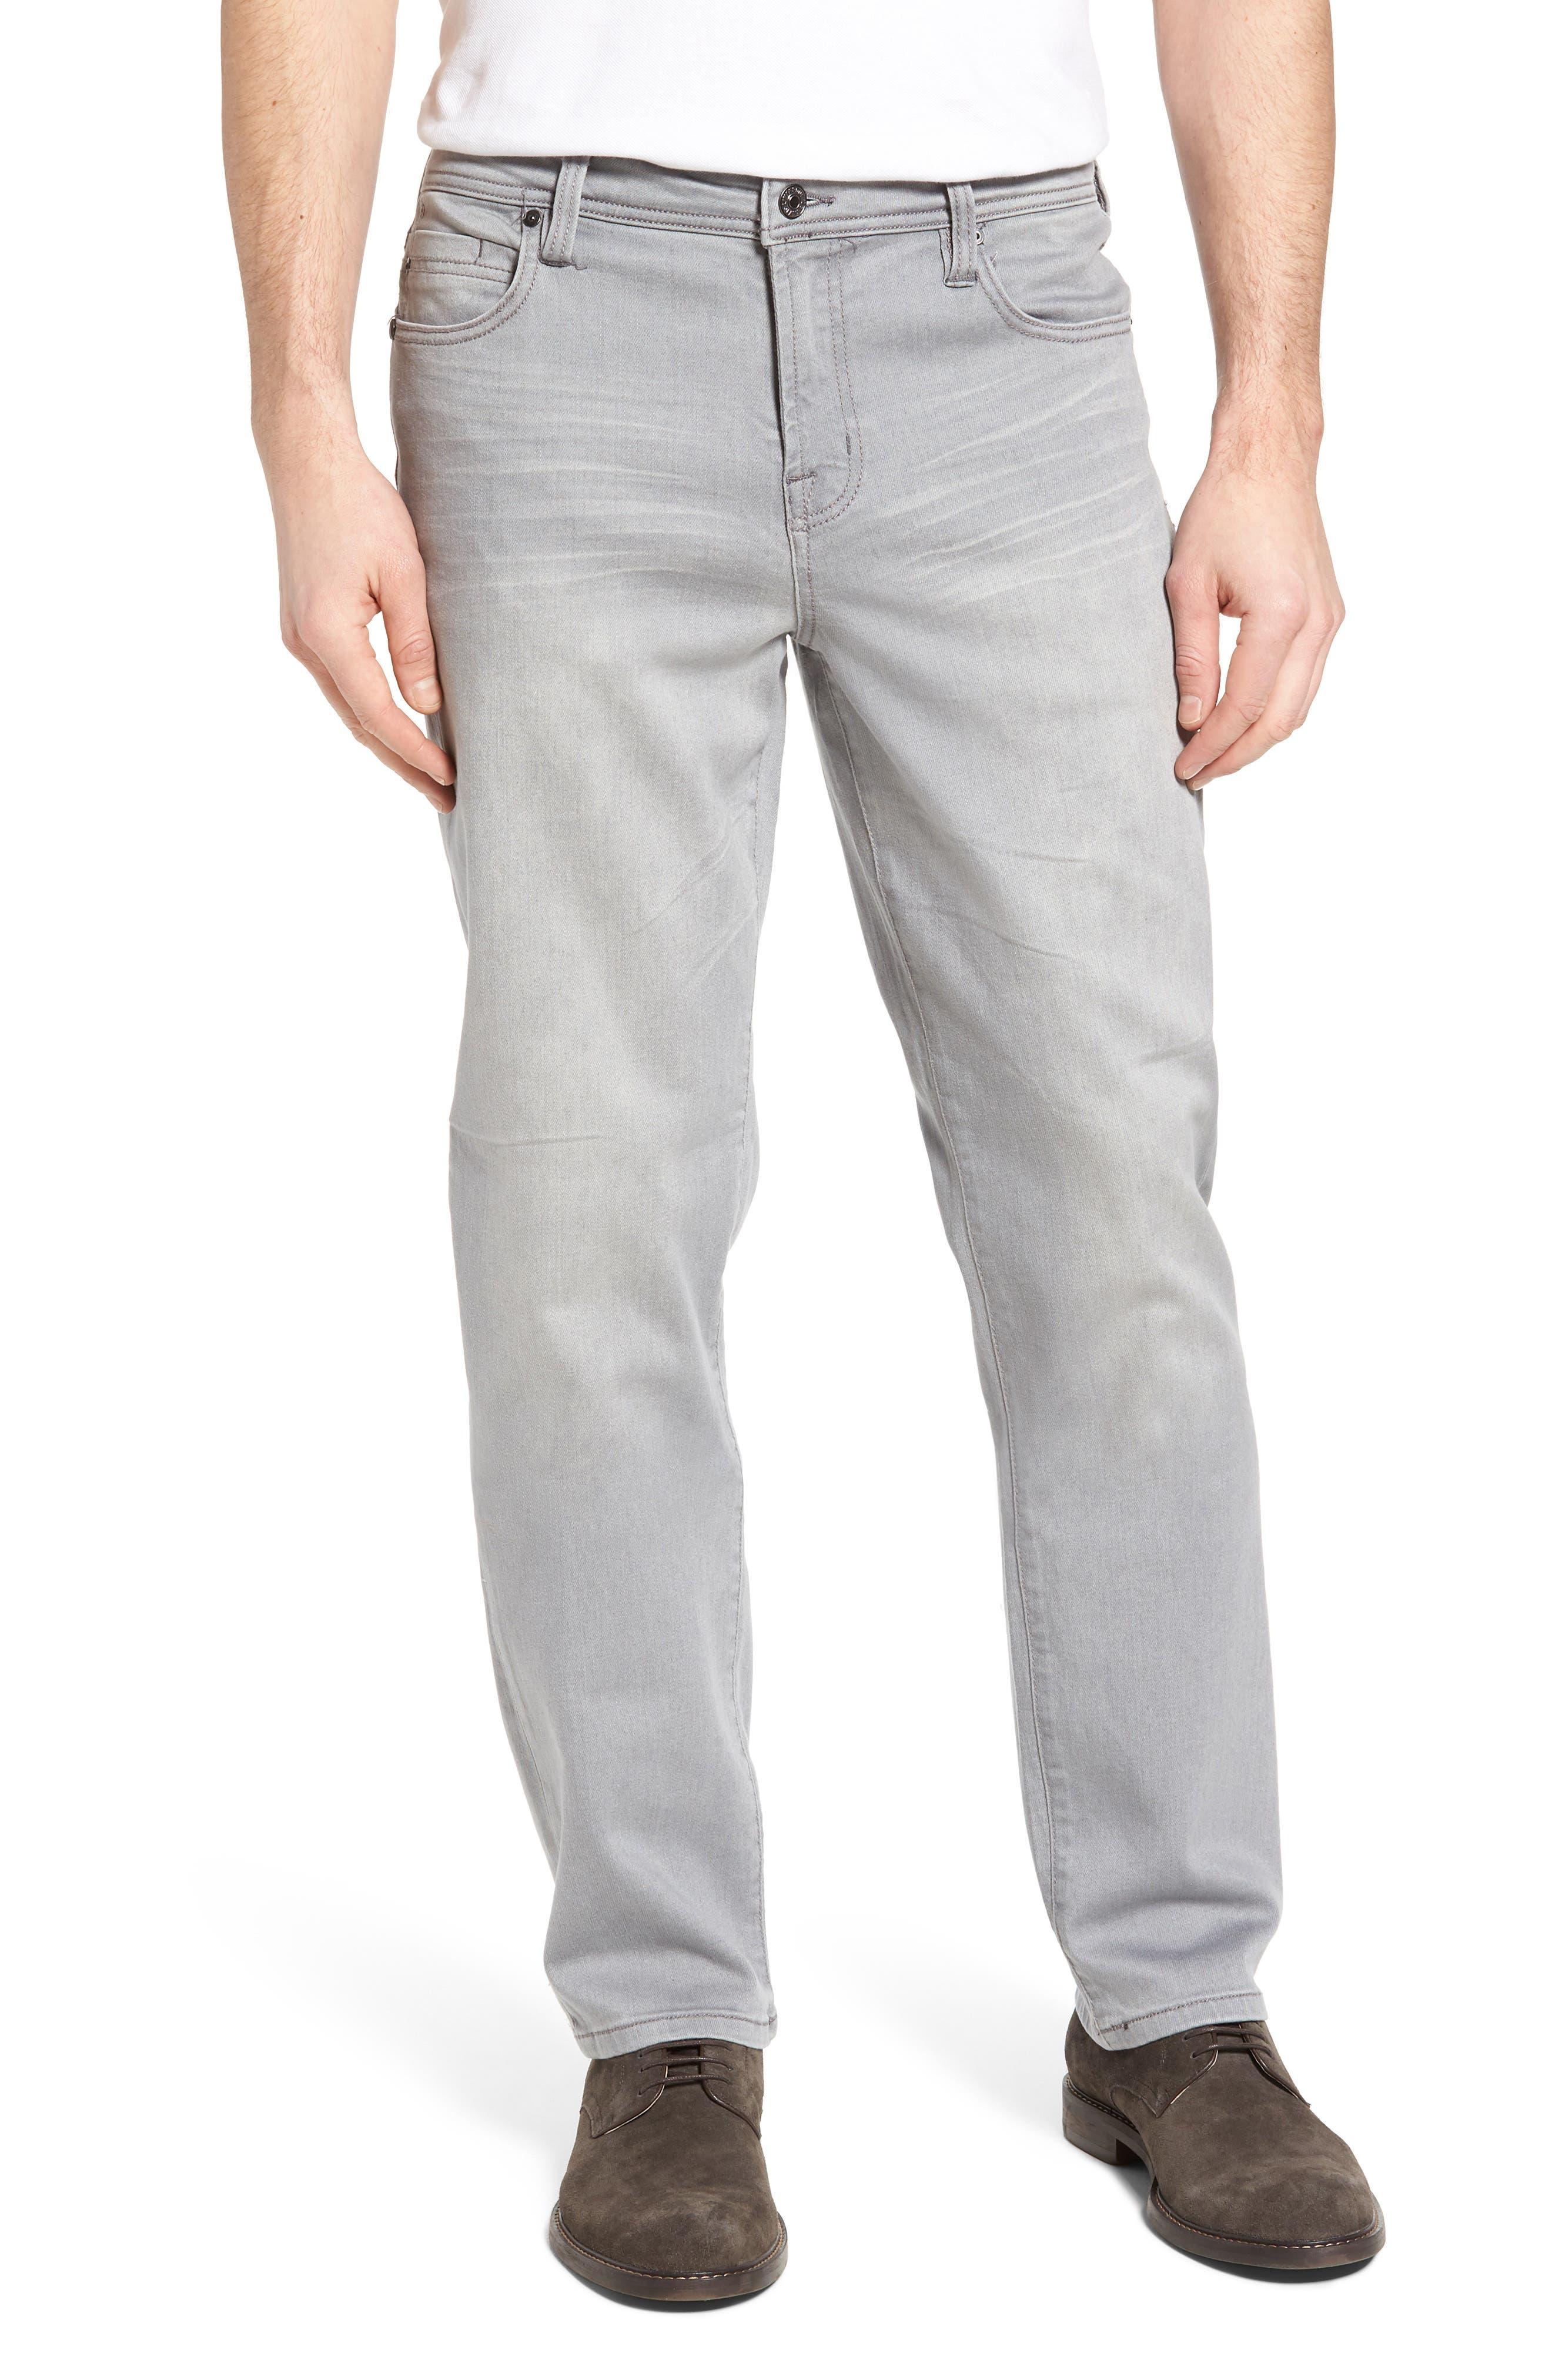 LIVERPOOL, Regent Relaxed Straight Leg Jeans, Main thumbnail 1, color, COAL MINE DARK